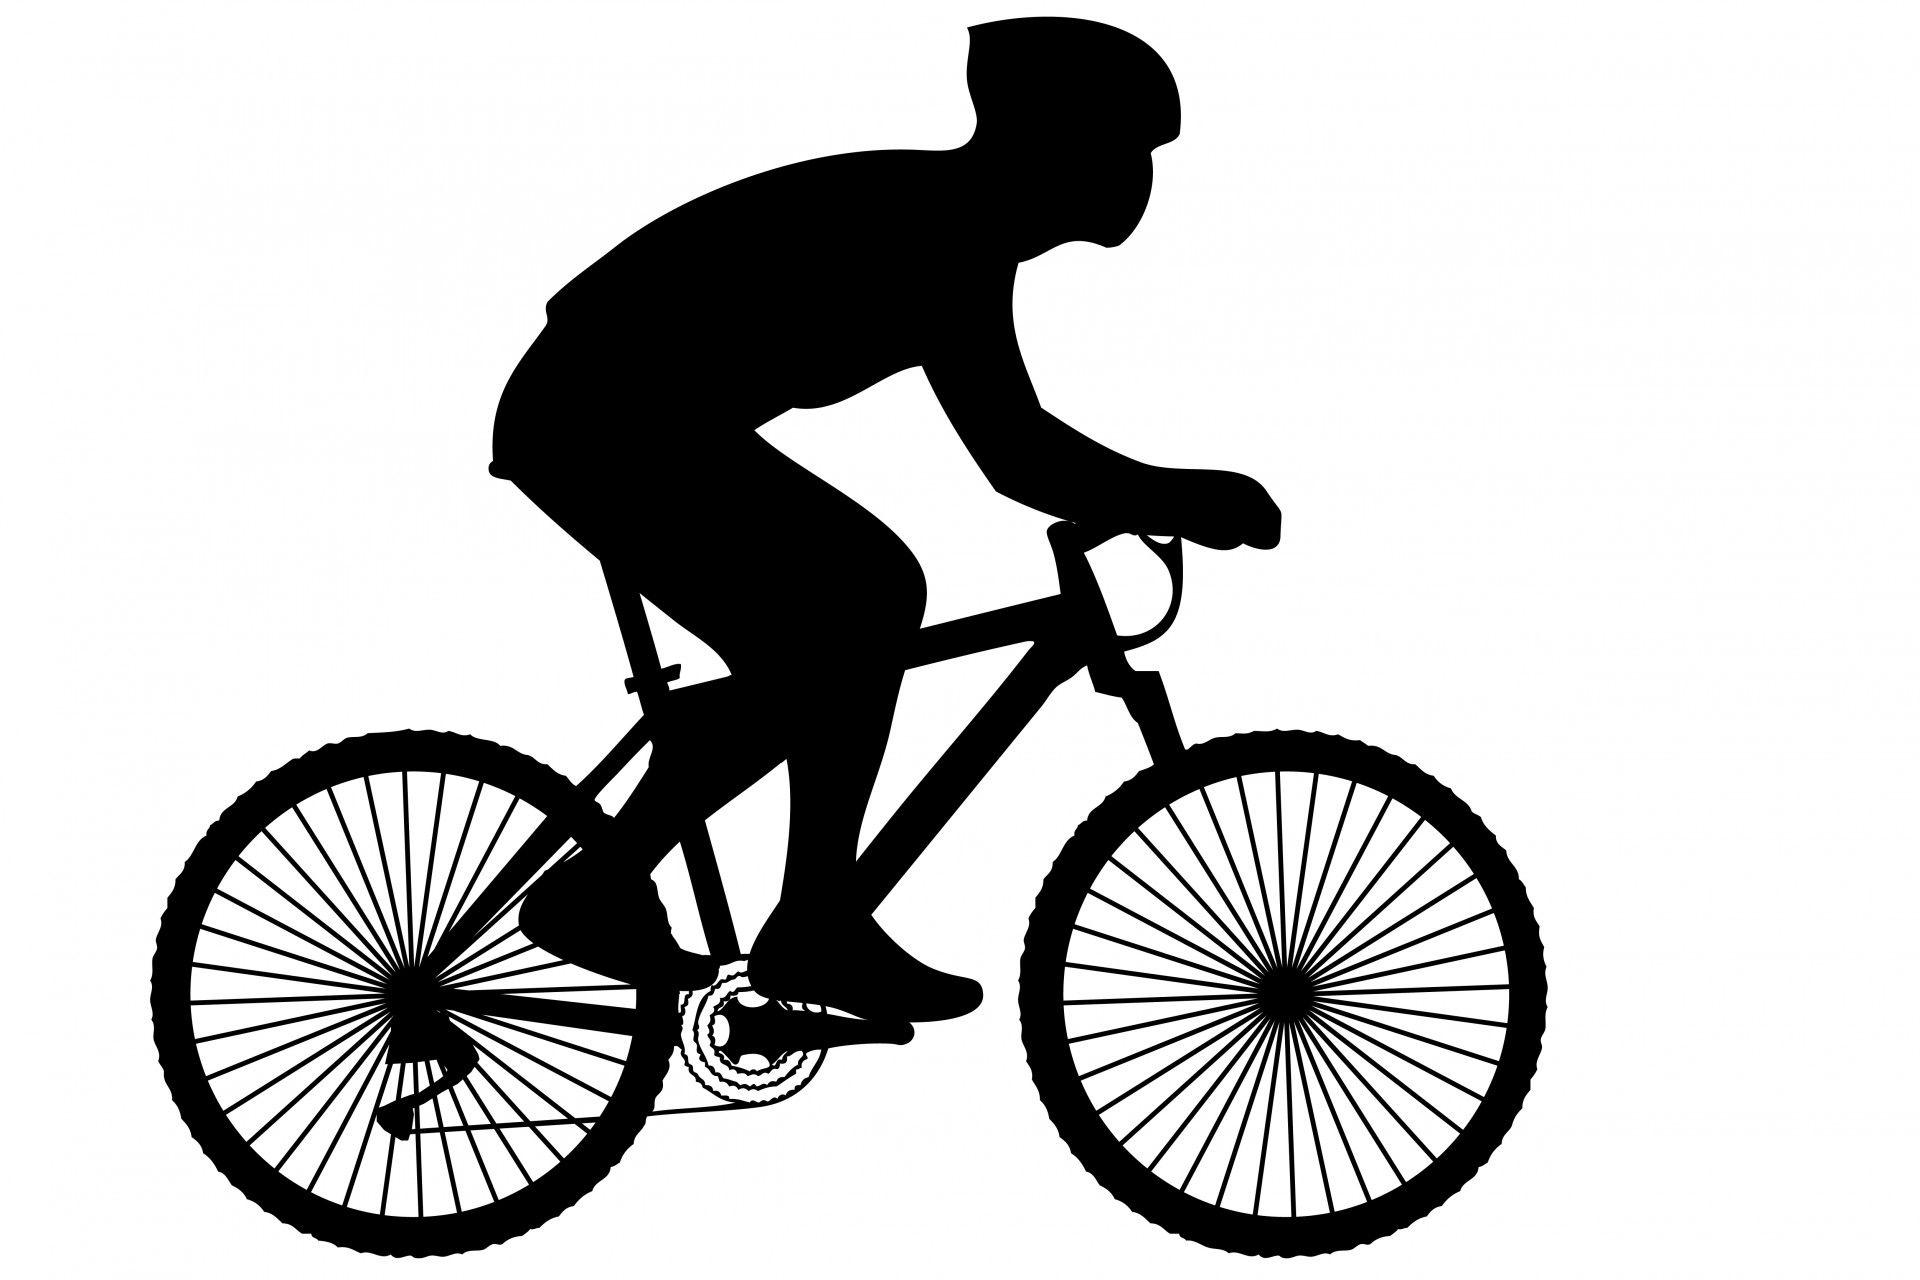 Black silhouette of a. Biking clipart illustration